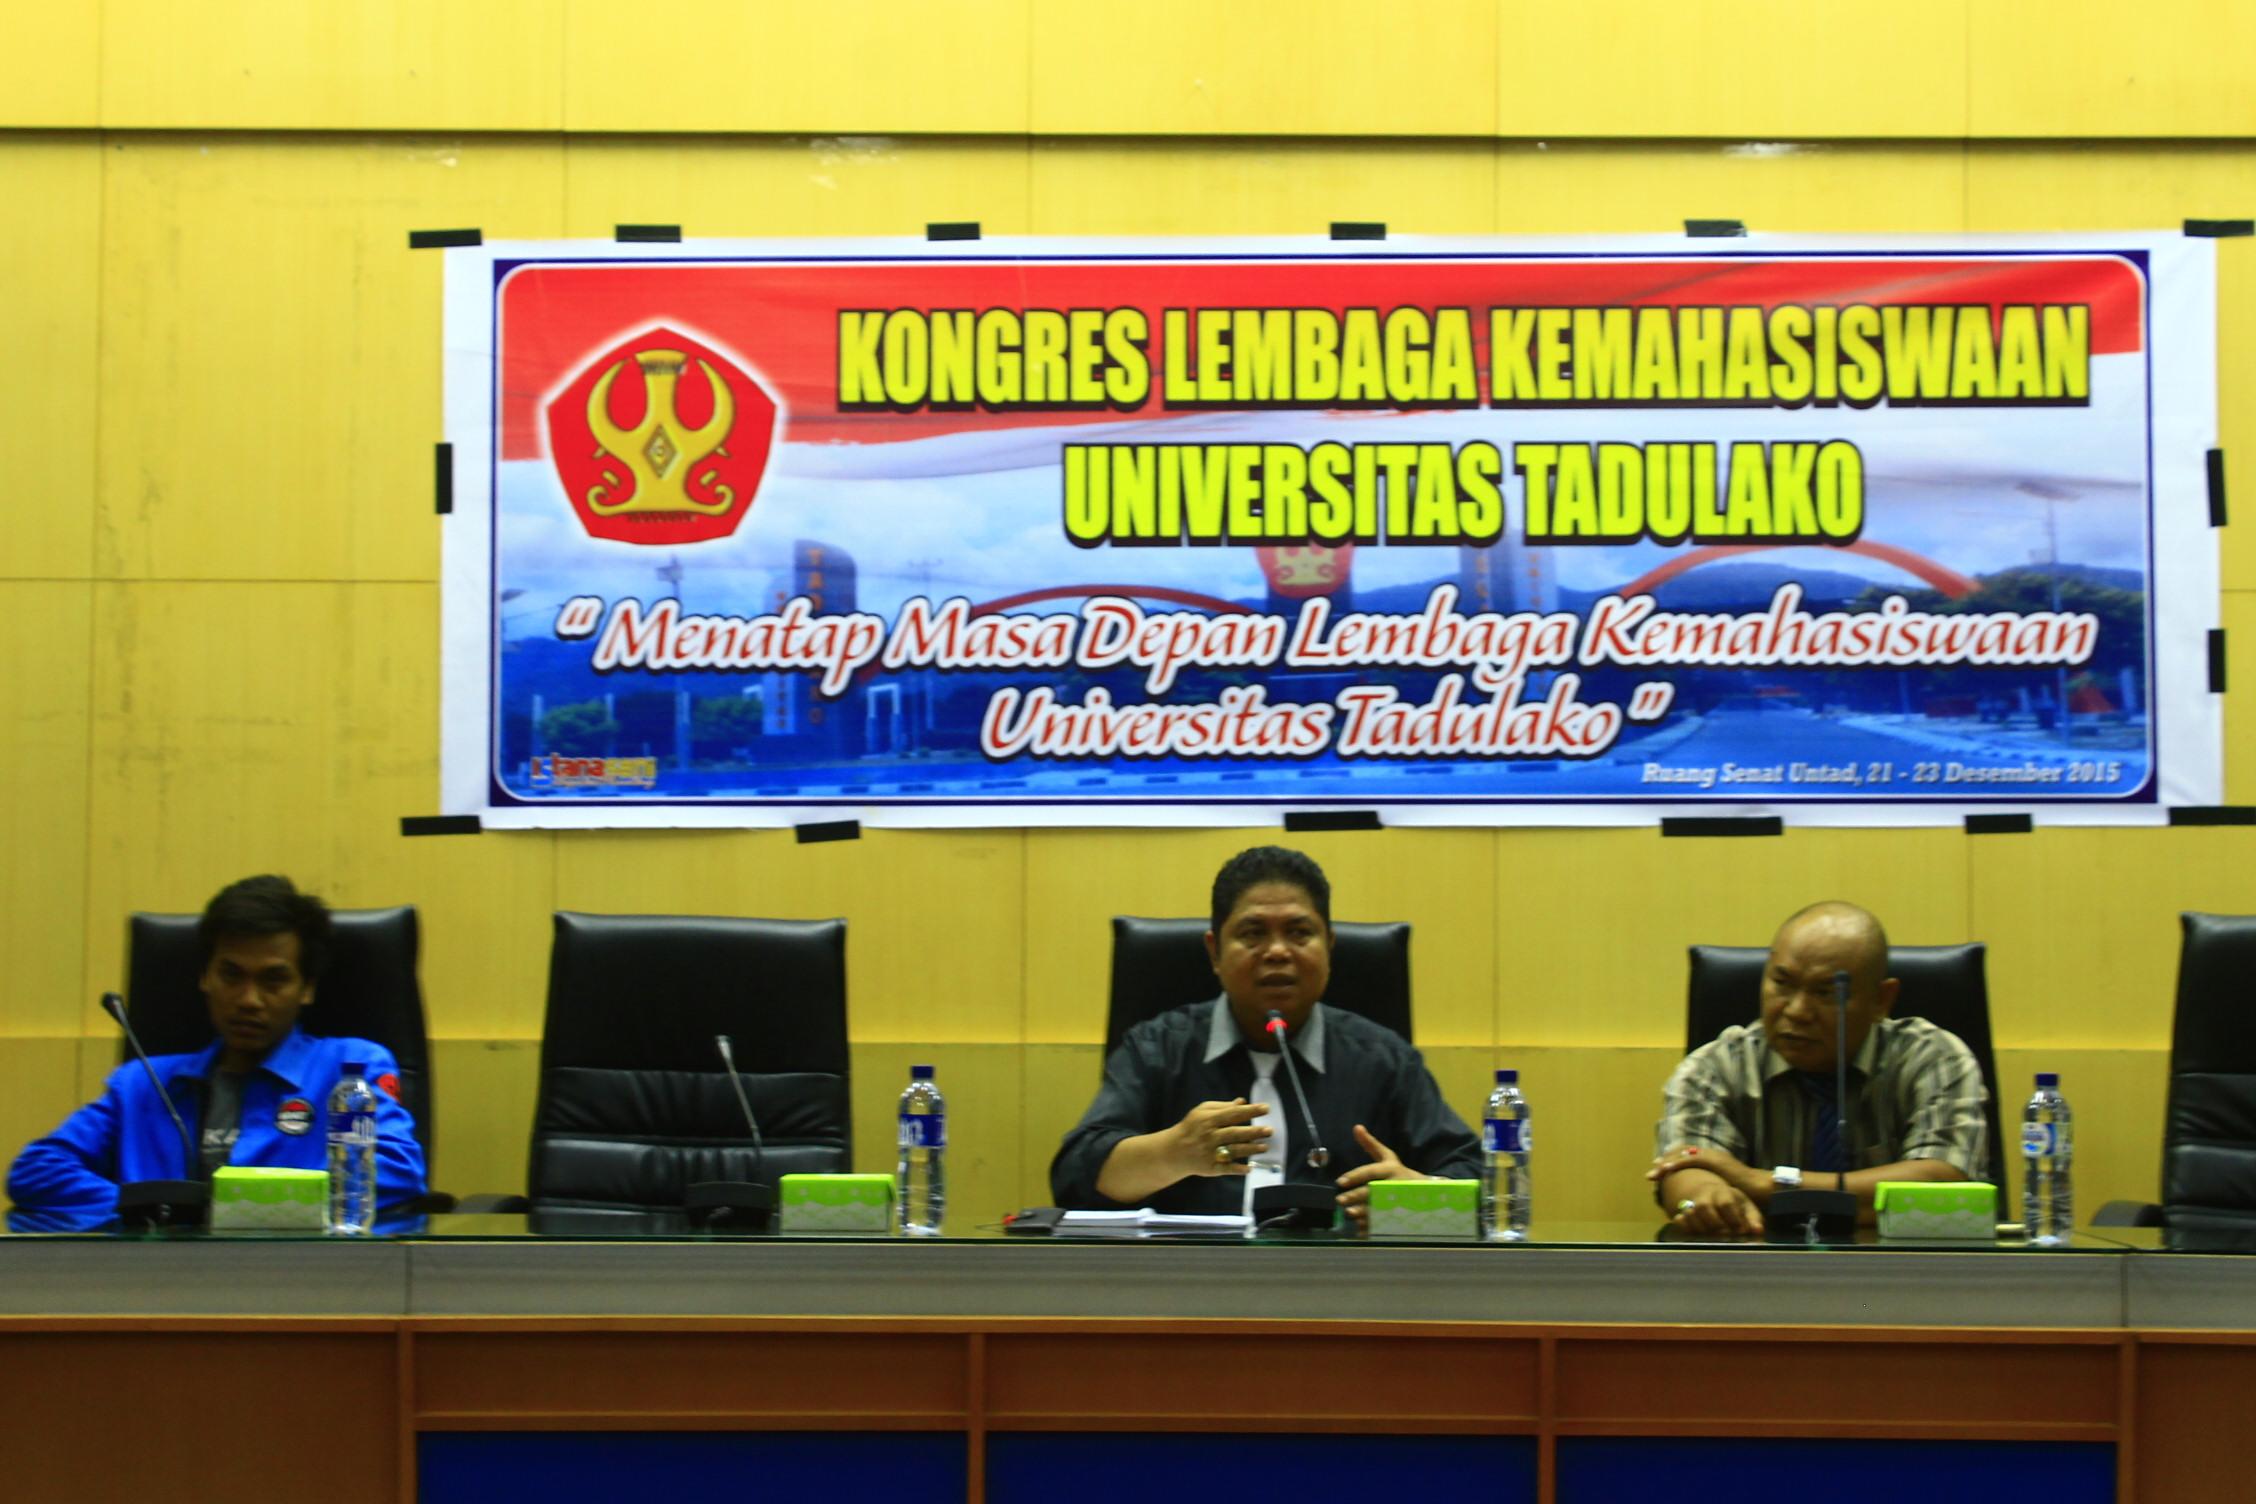 Kongres Lembaga Kemahasiswaan, Bangun Minat Berorganisasi